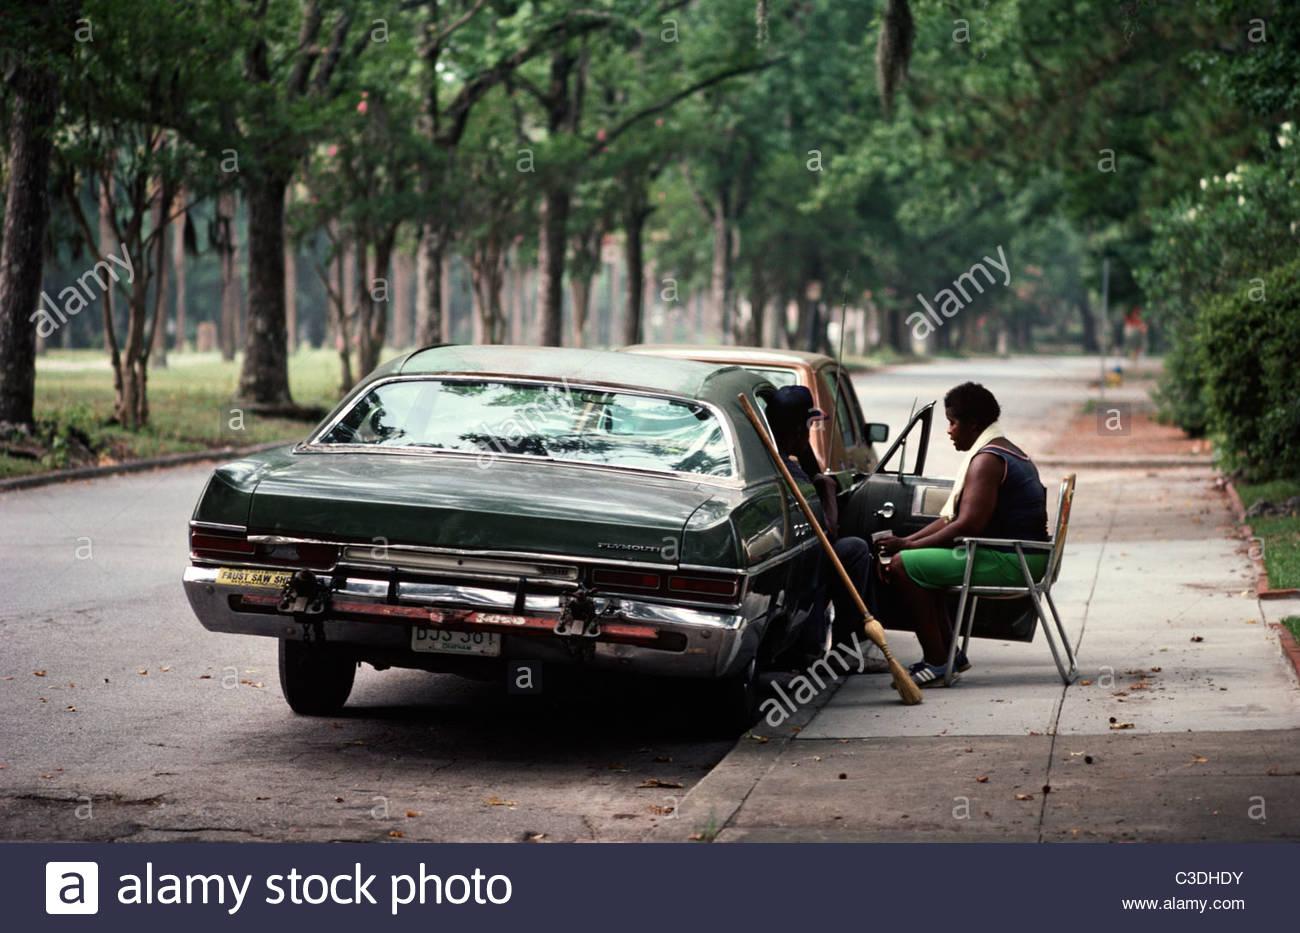 Relaxing in car, Savannah, Georgia, USA, 80's - Stock Image